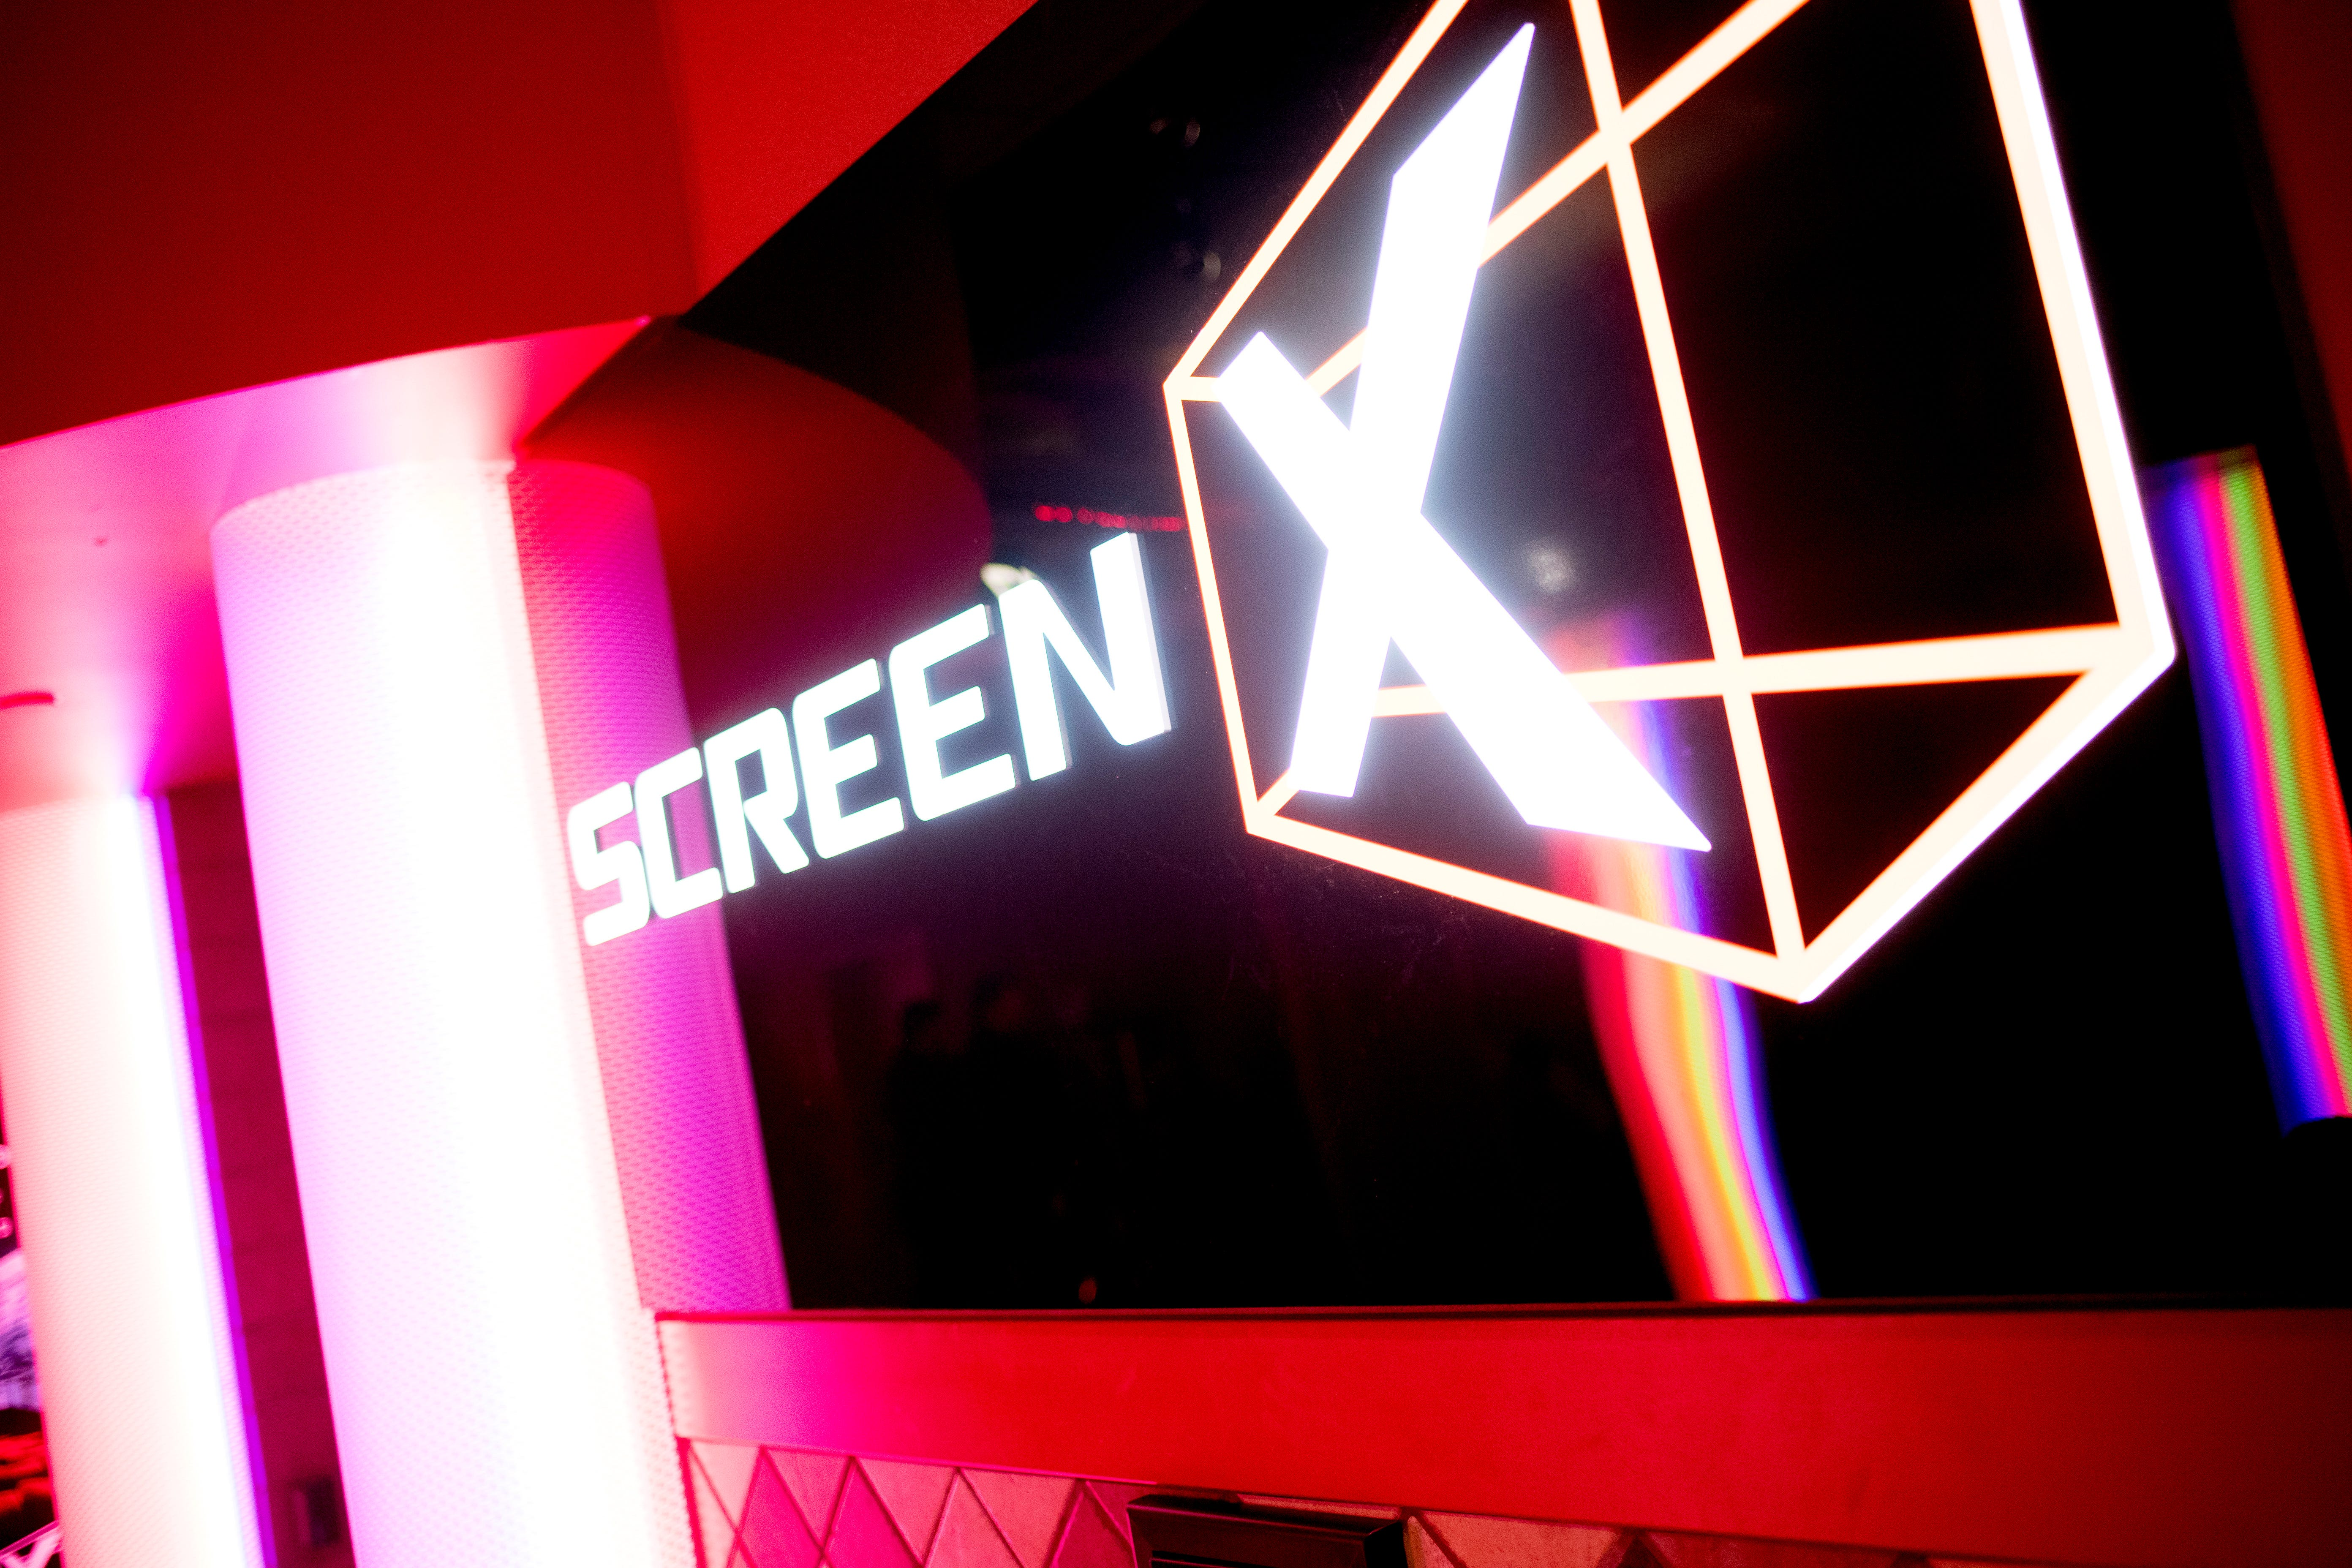 Experience Regal's new 270-degree screen technology ScreenX